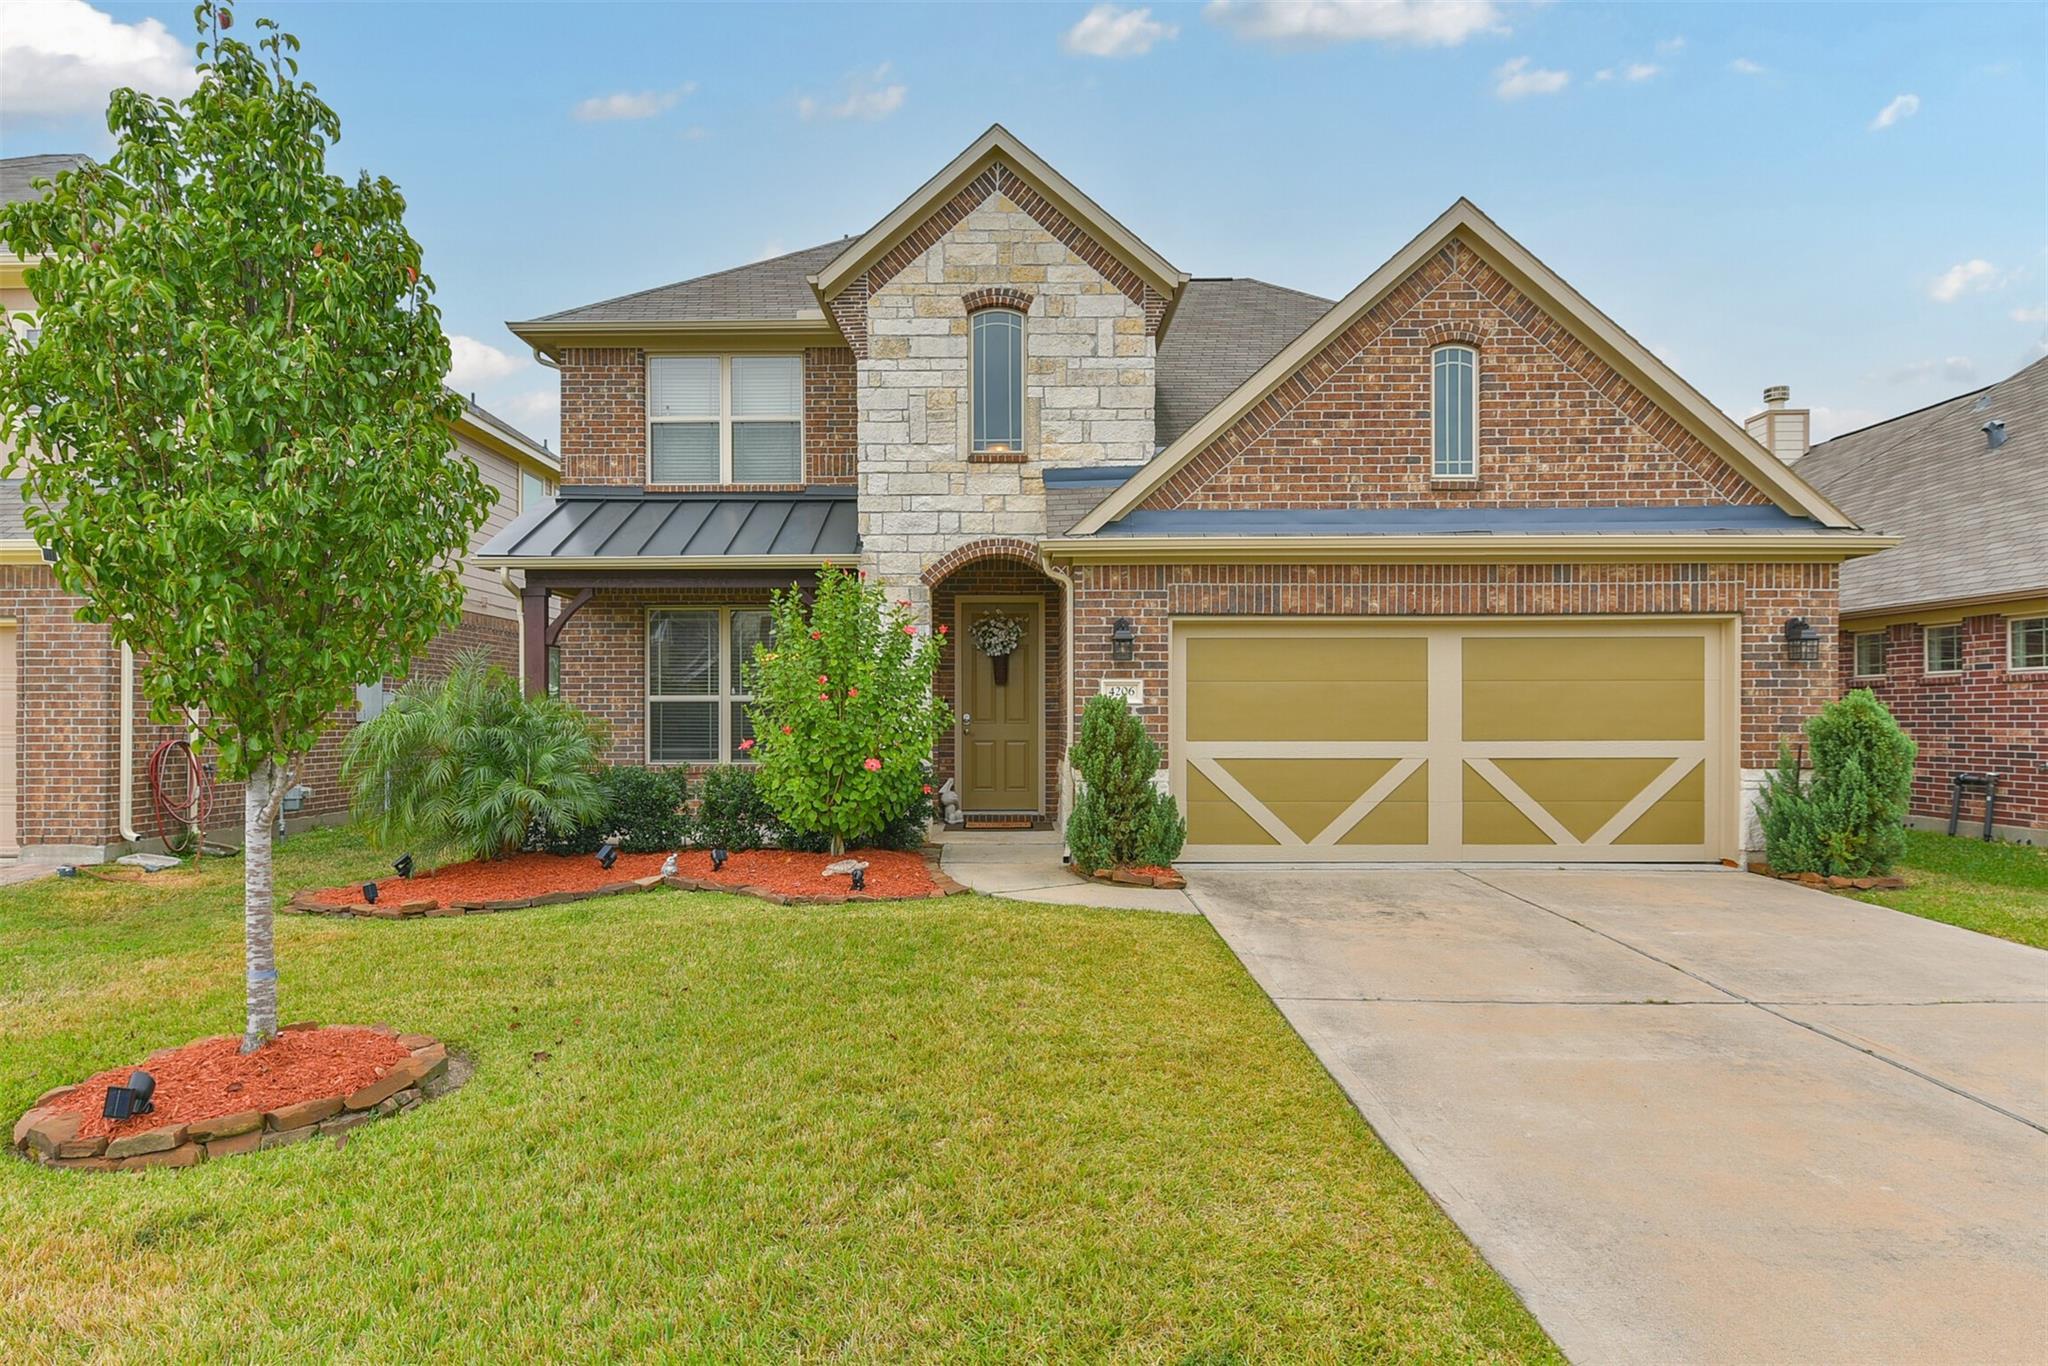 4206 Dave Alvin Drive Property Photo - Deer Park, TX real estate listing